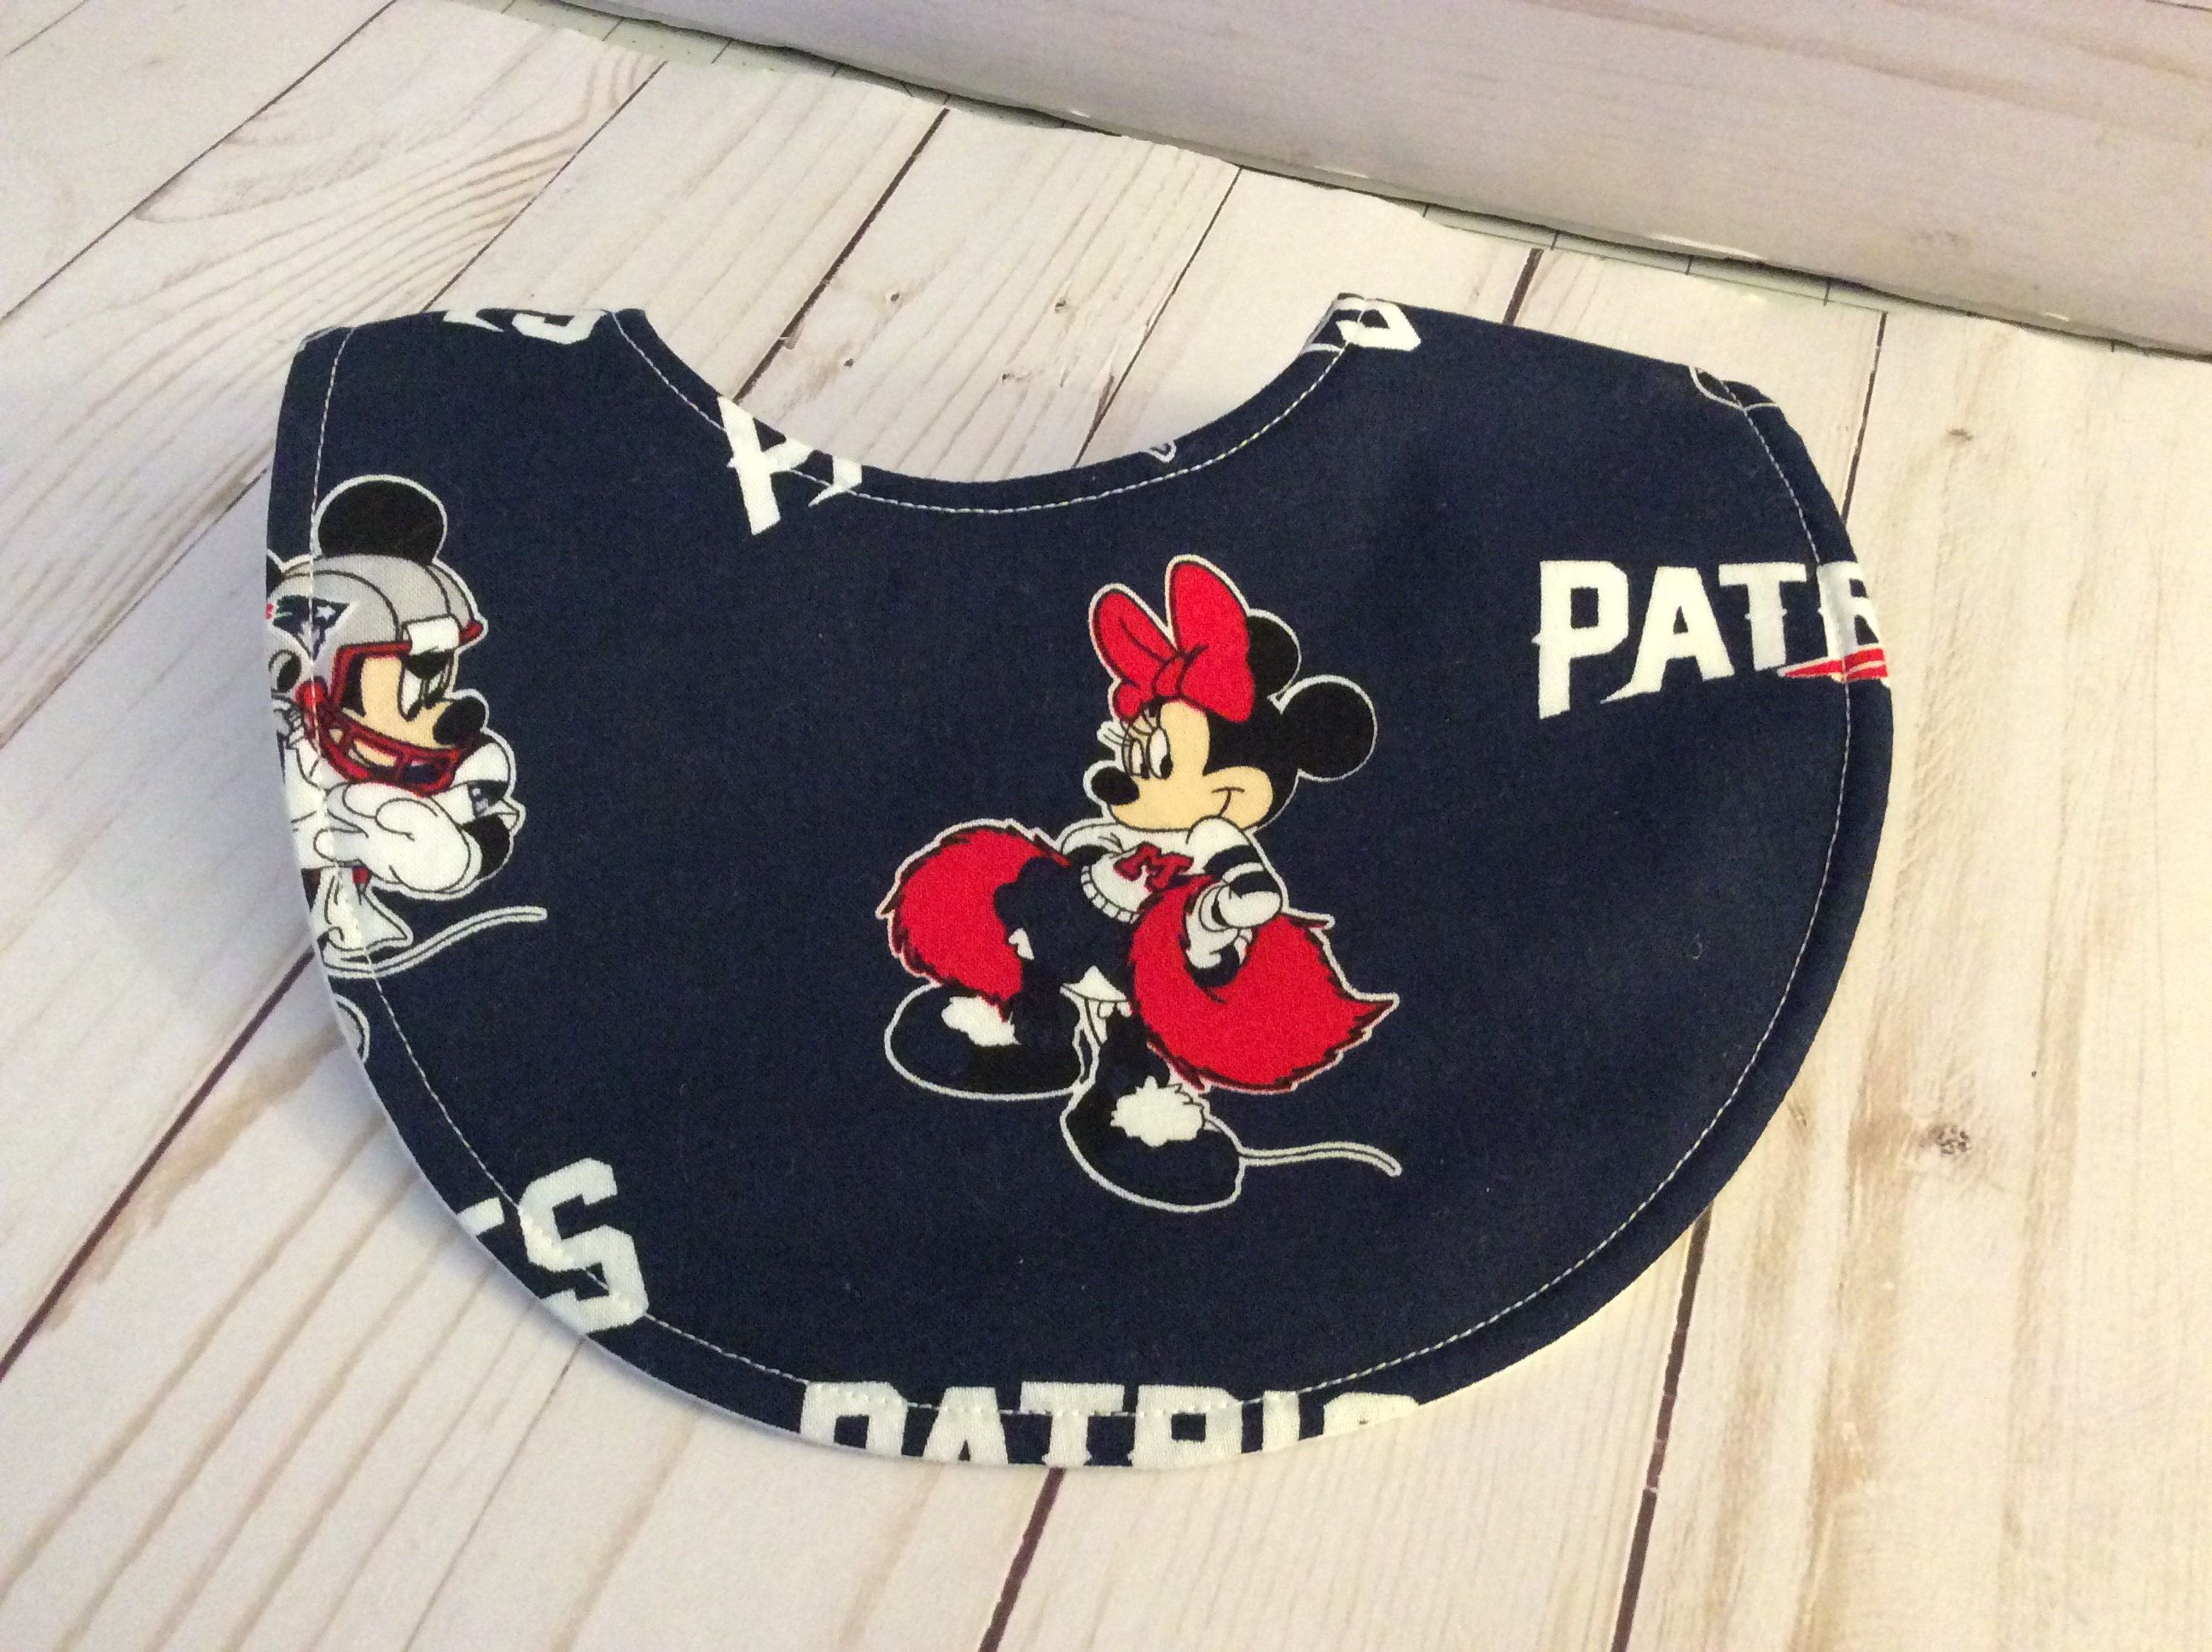 New England Patriots Mnne Mouse Bibs Baby Bib Baby Girl Disney NE Patriots  Football Patriots Baby Gift NFL Baby Bib by OliversNursery on Etsy cf5ea395b